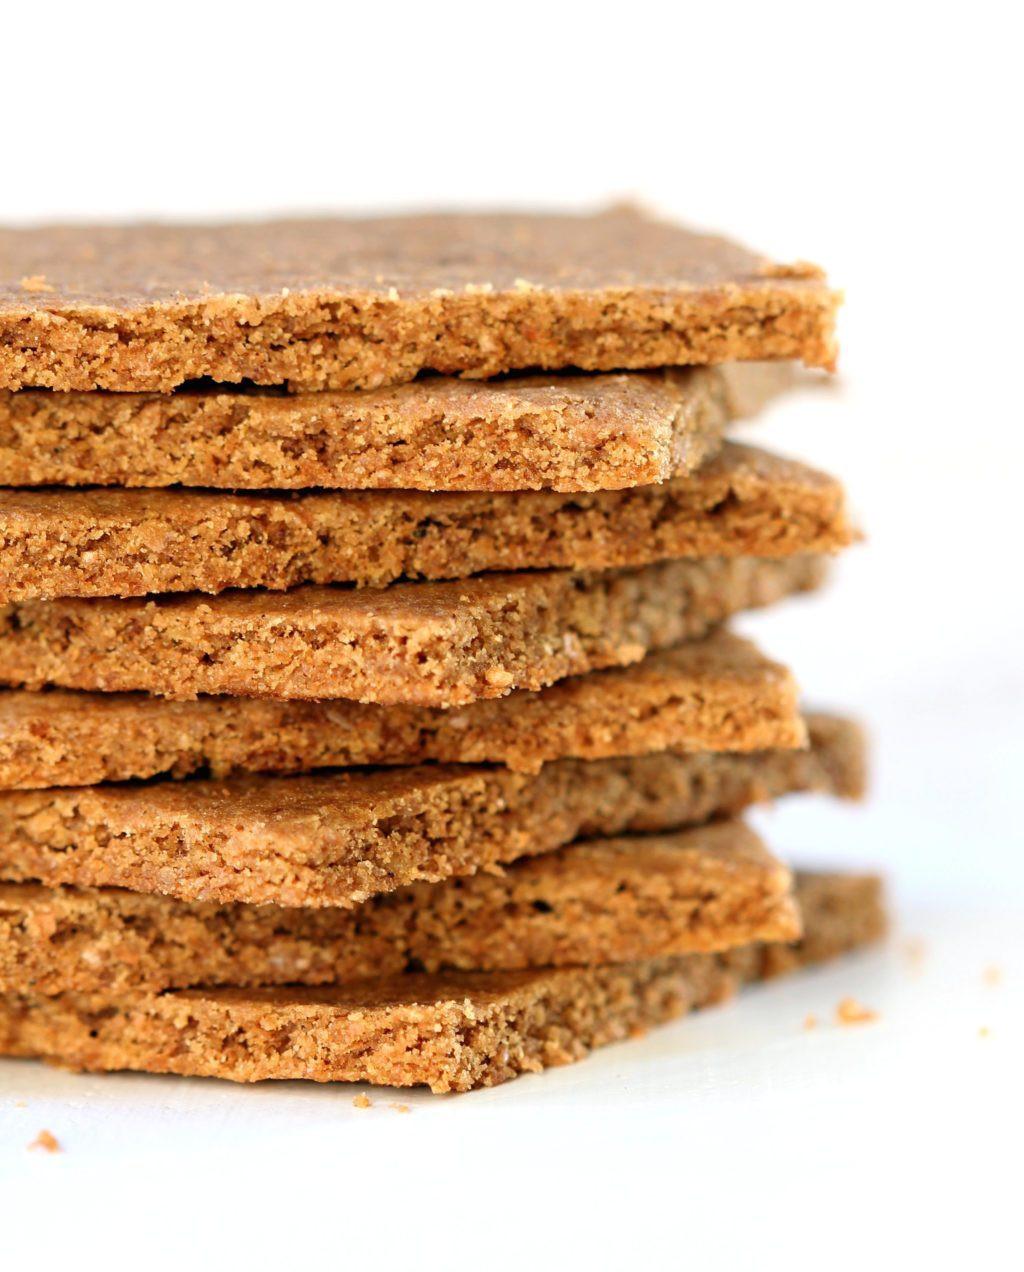 Graham Cracker Snacks Healthy  Homemade Whole Food Graham Crackers